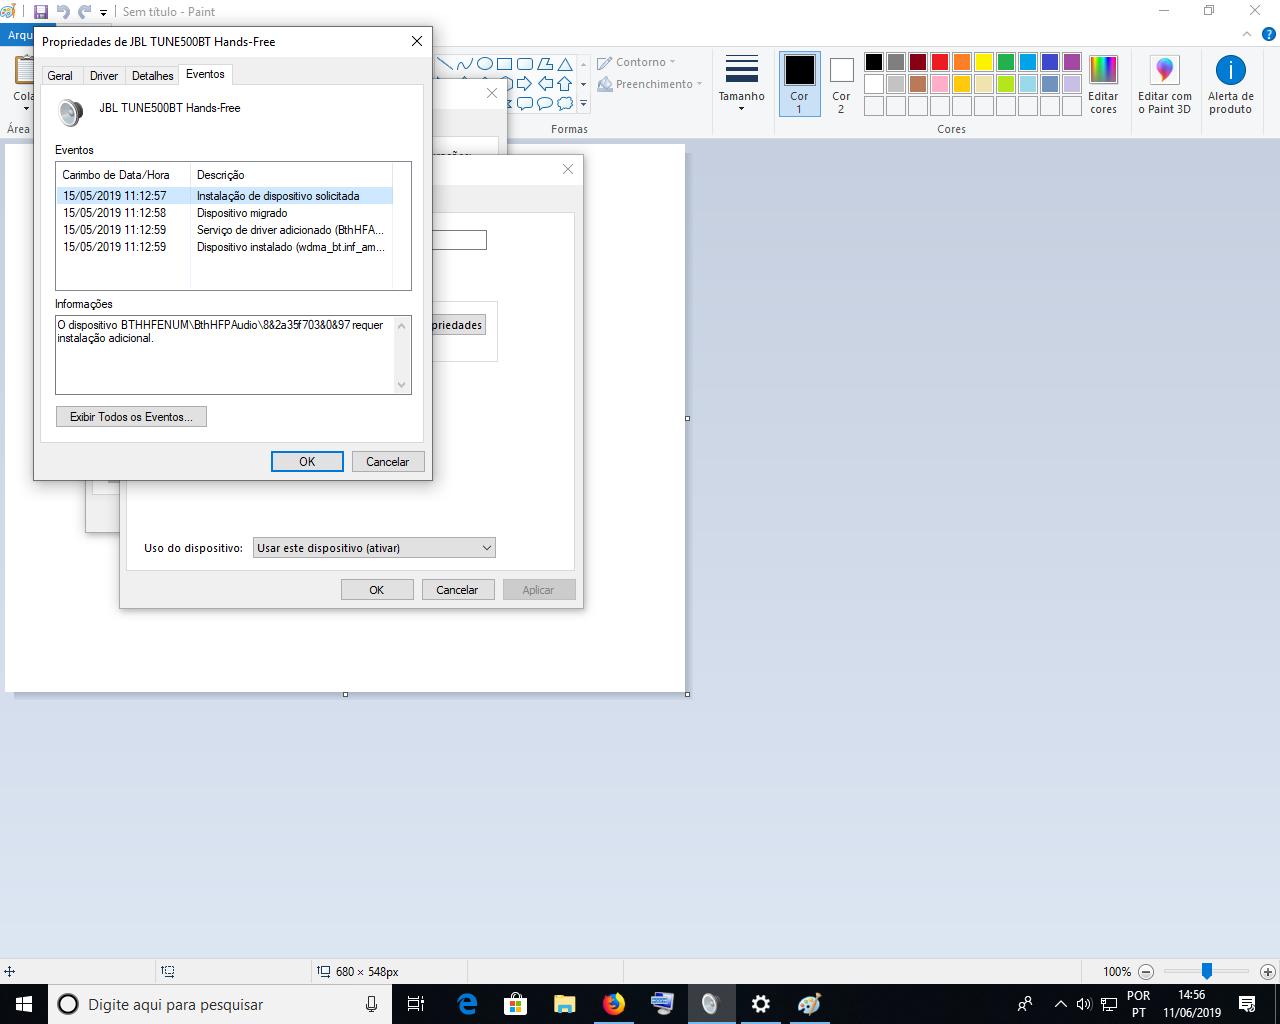 Handsfree mic bluetooth does not work 8089fac2-b7c3-4c1b-a6ef-4fcd39b8b647?upload=true.png